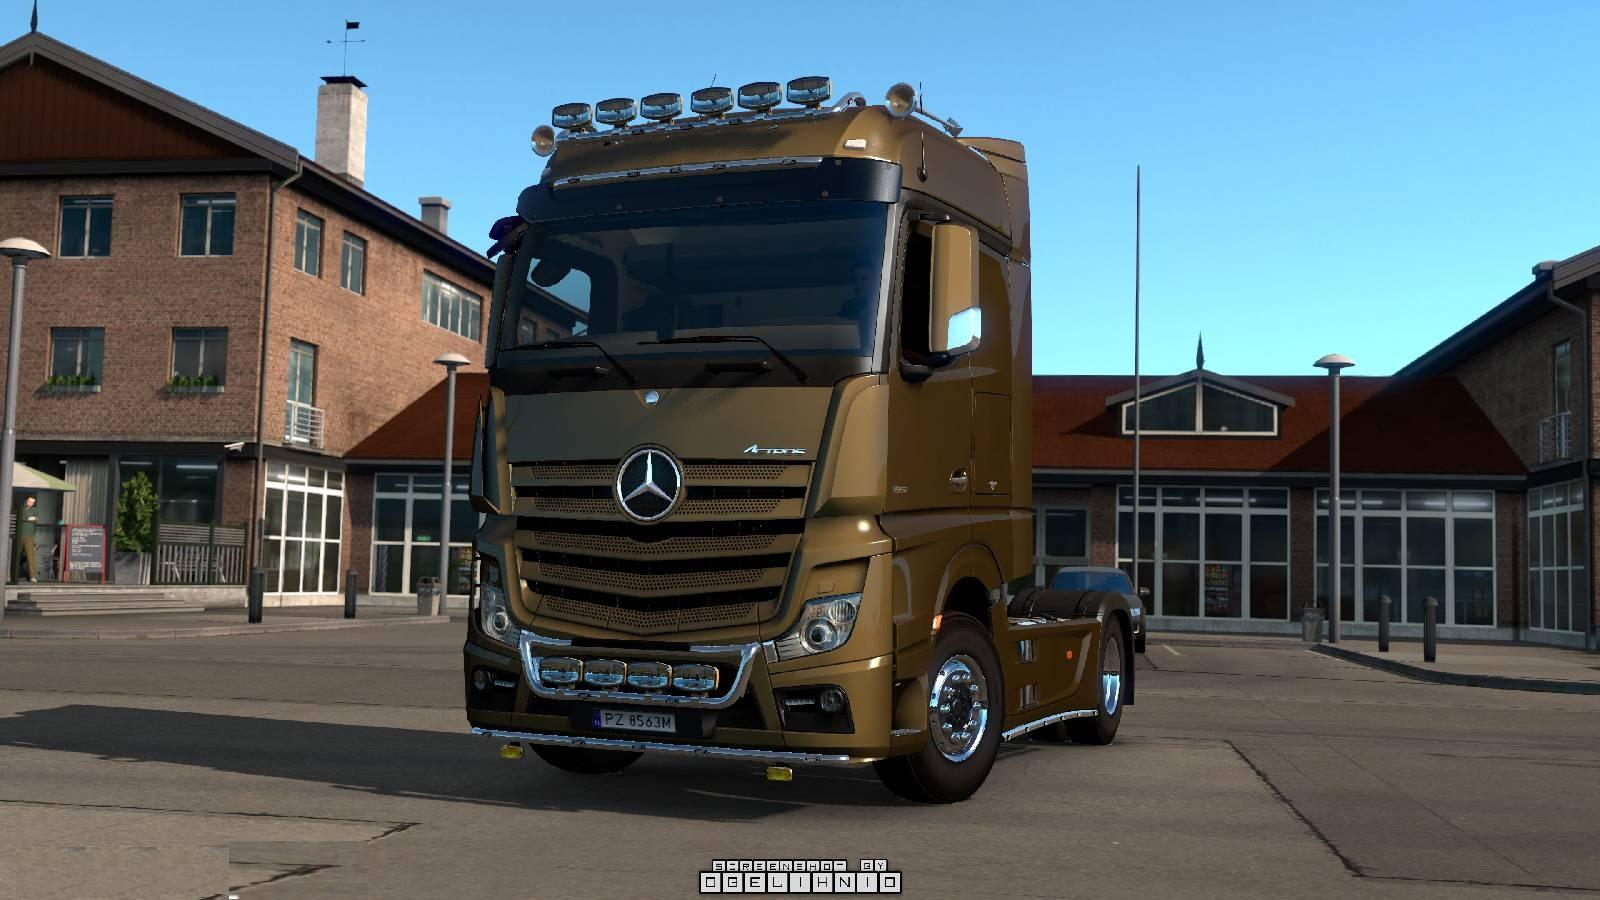 Awm camiones MB actros mp3 LH//aerop ga-ksz Senit Querfurt